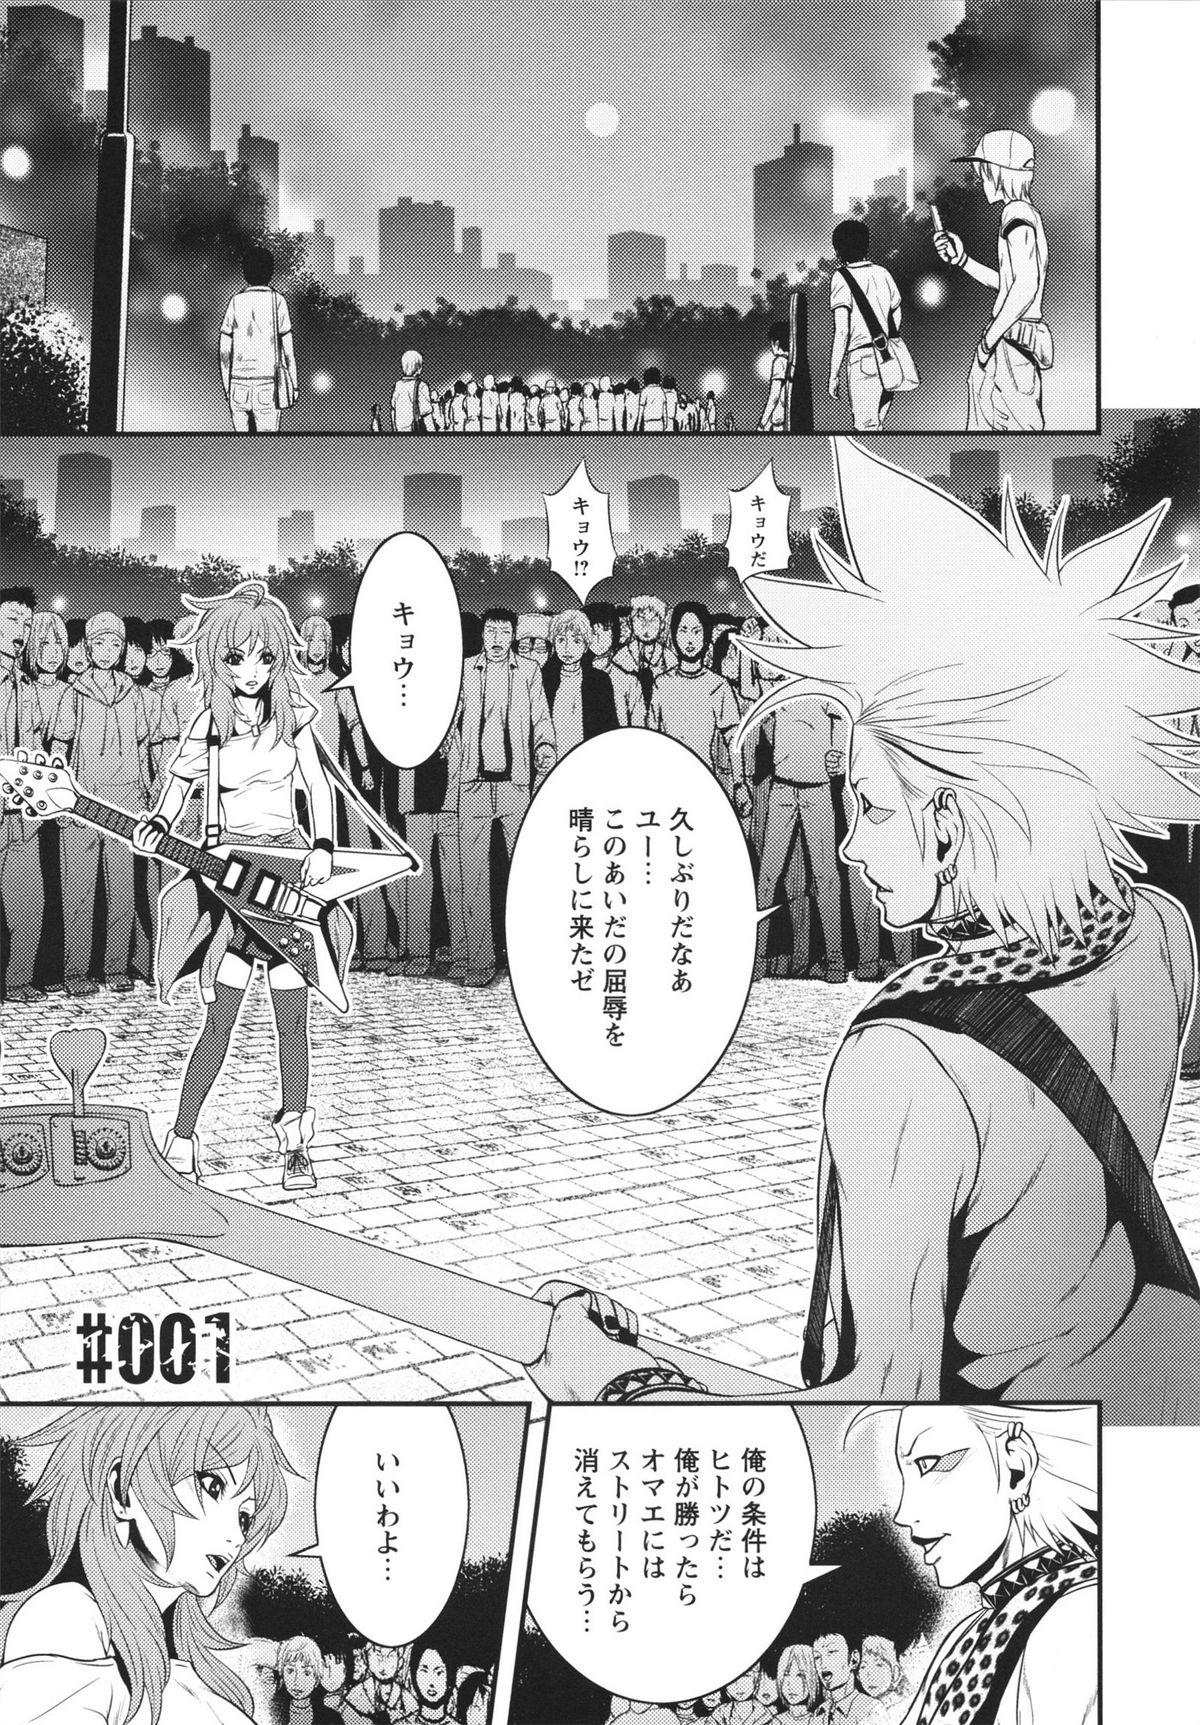 [Kawazuko Chouji] m7 -Minor Seven- Jou 12